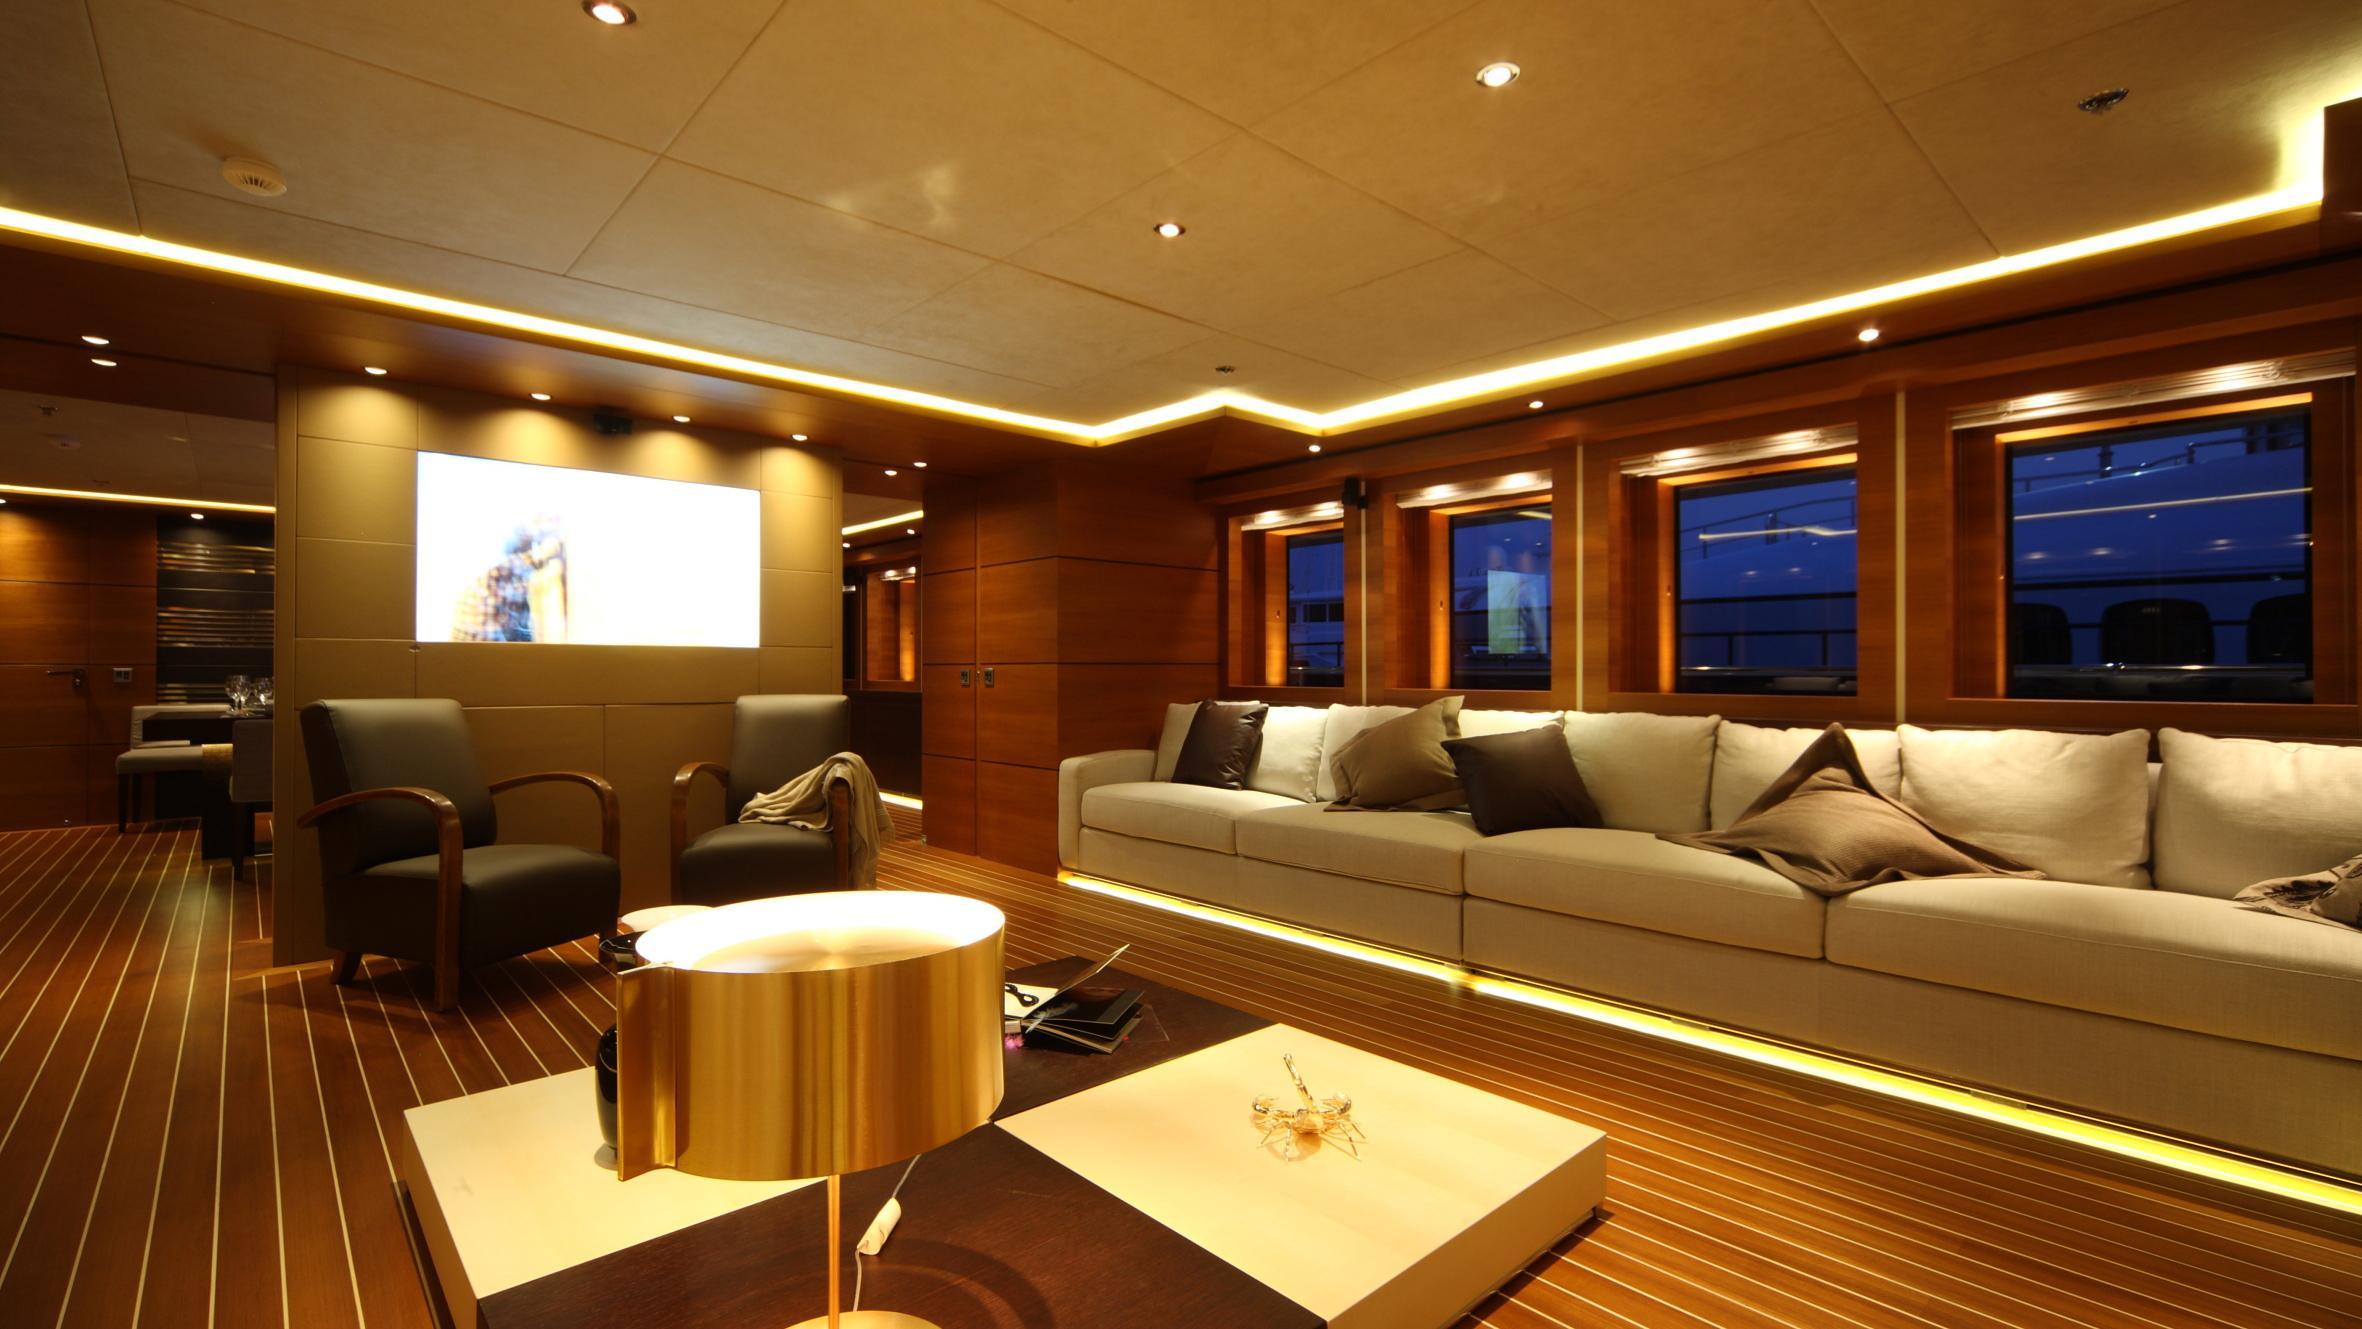 zaliv-iii-yacht-saloon